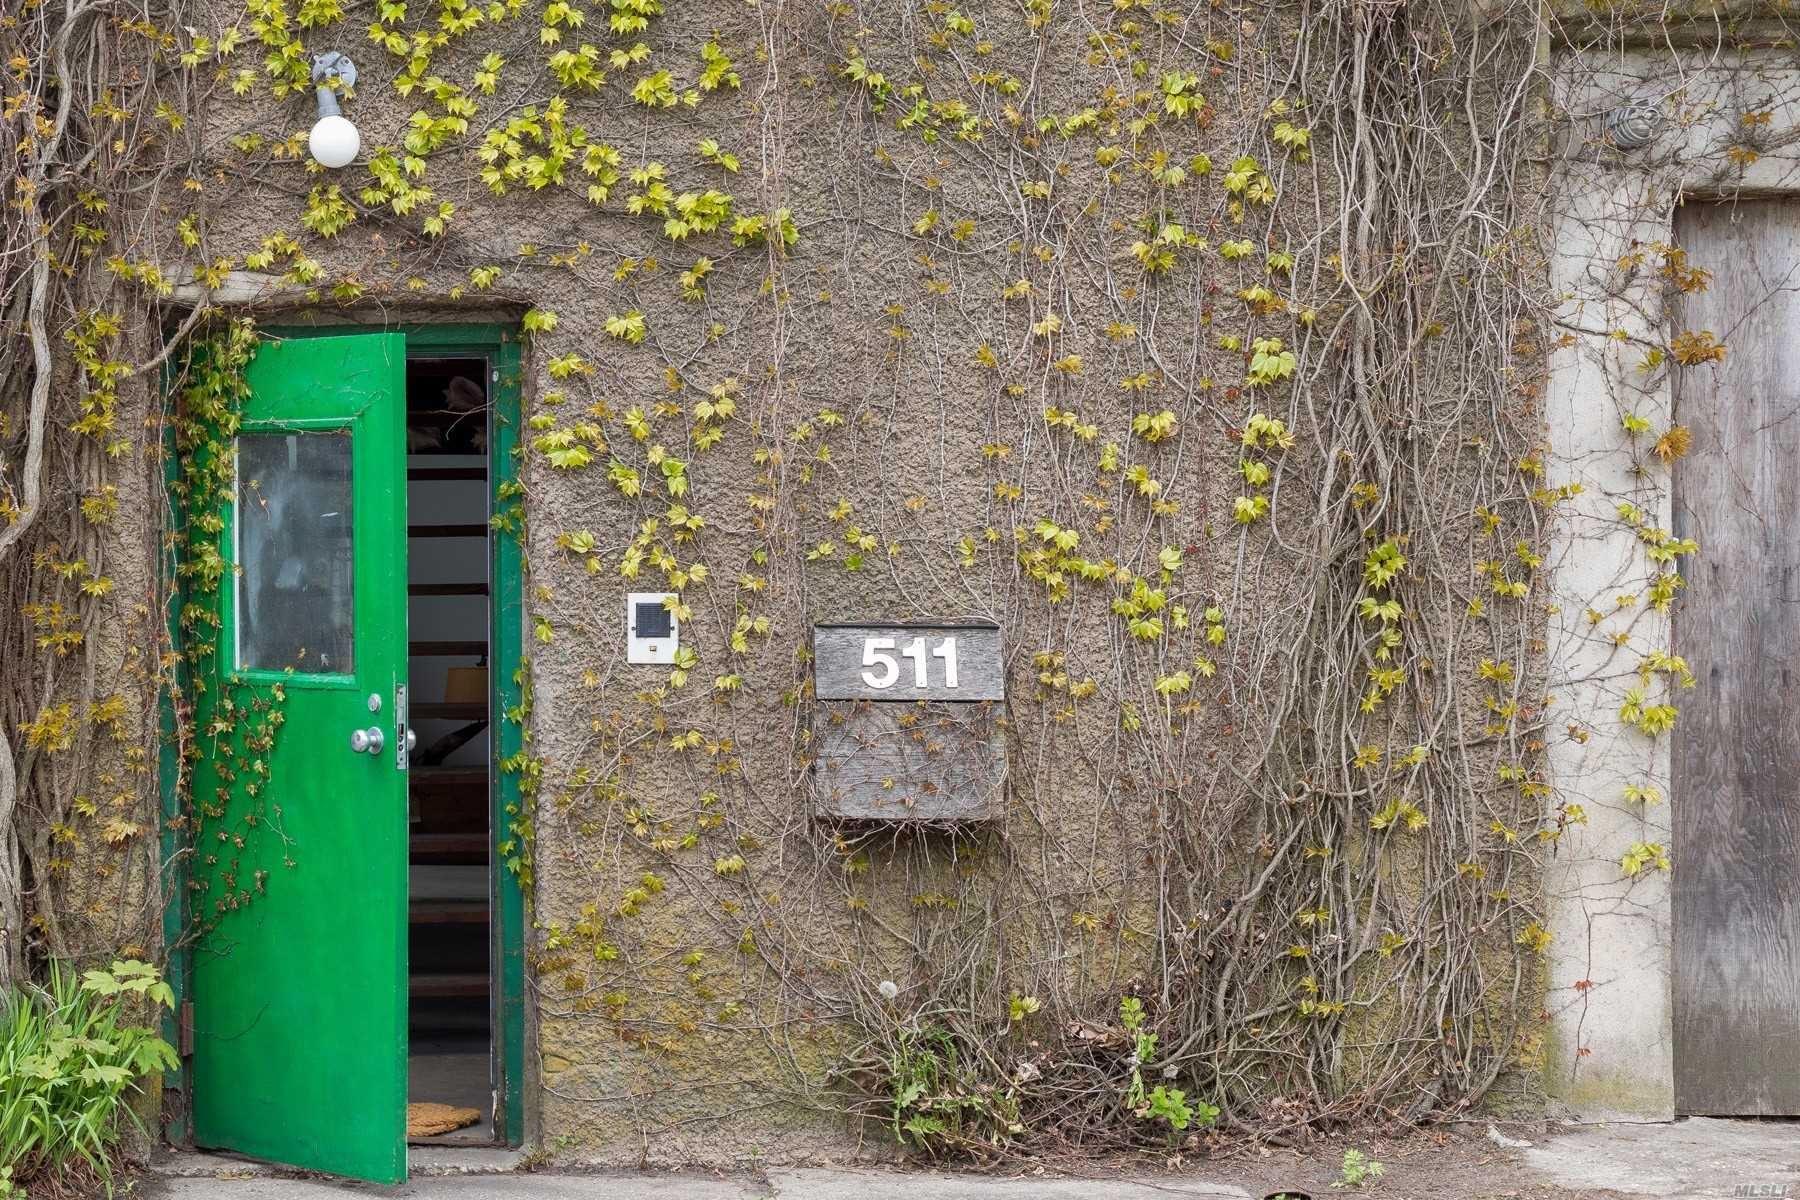 511 Carpenter Street, Greenport, NY 11944 - MLS#: 3214997